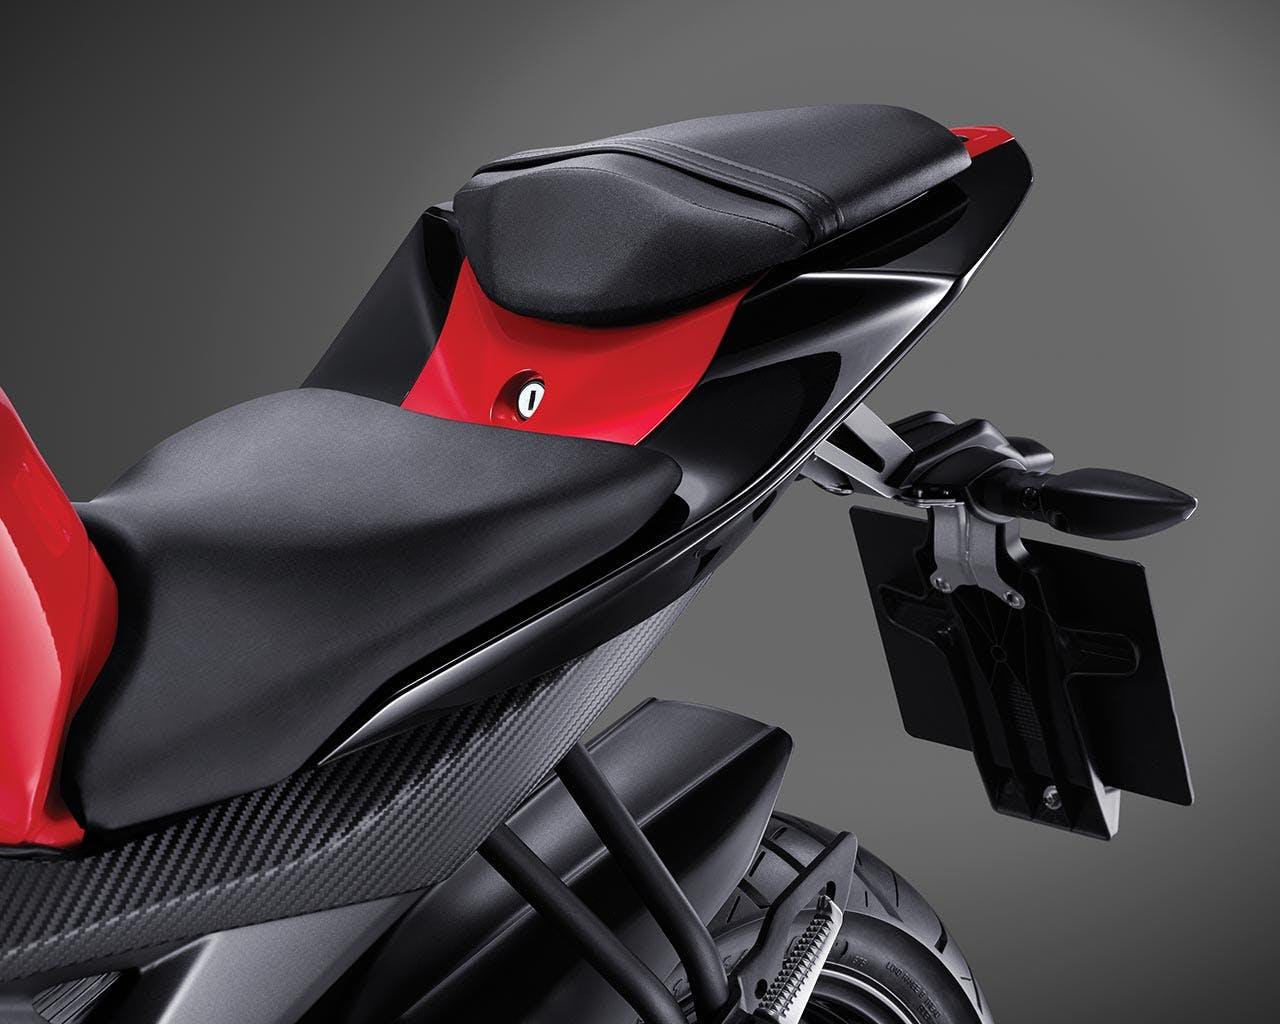 Yamaha YZF-R15 split seat with pillion